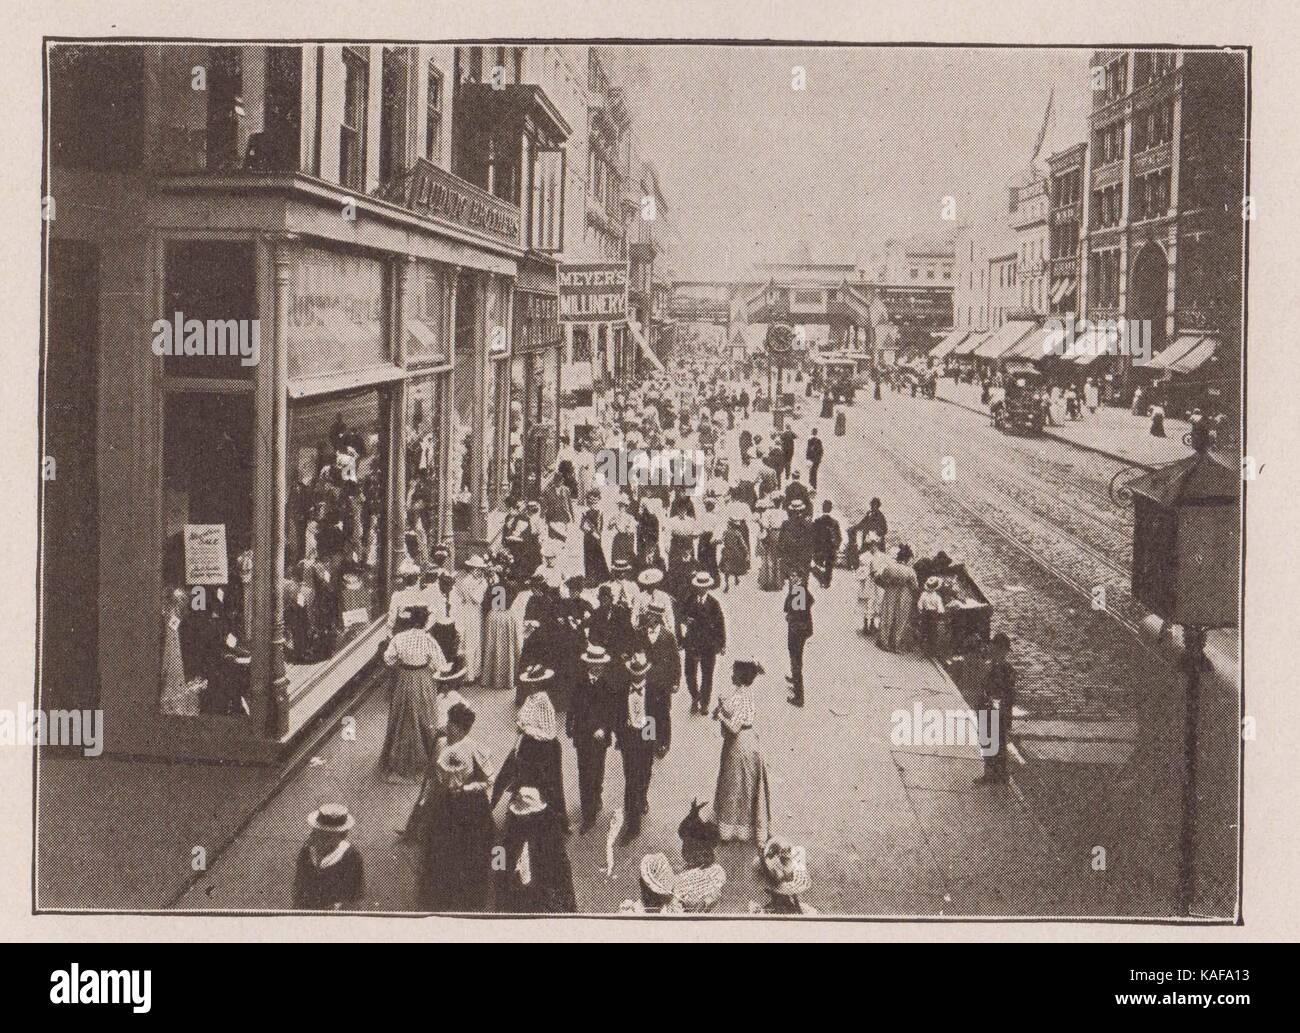 Fourteenth Street, Looking West - Stock Image